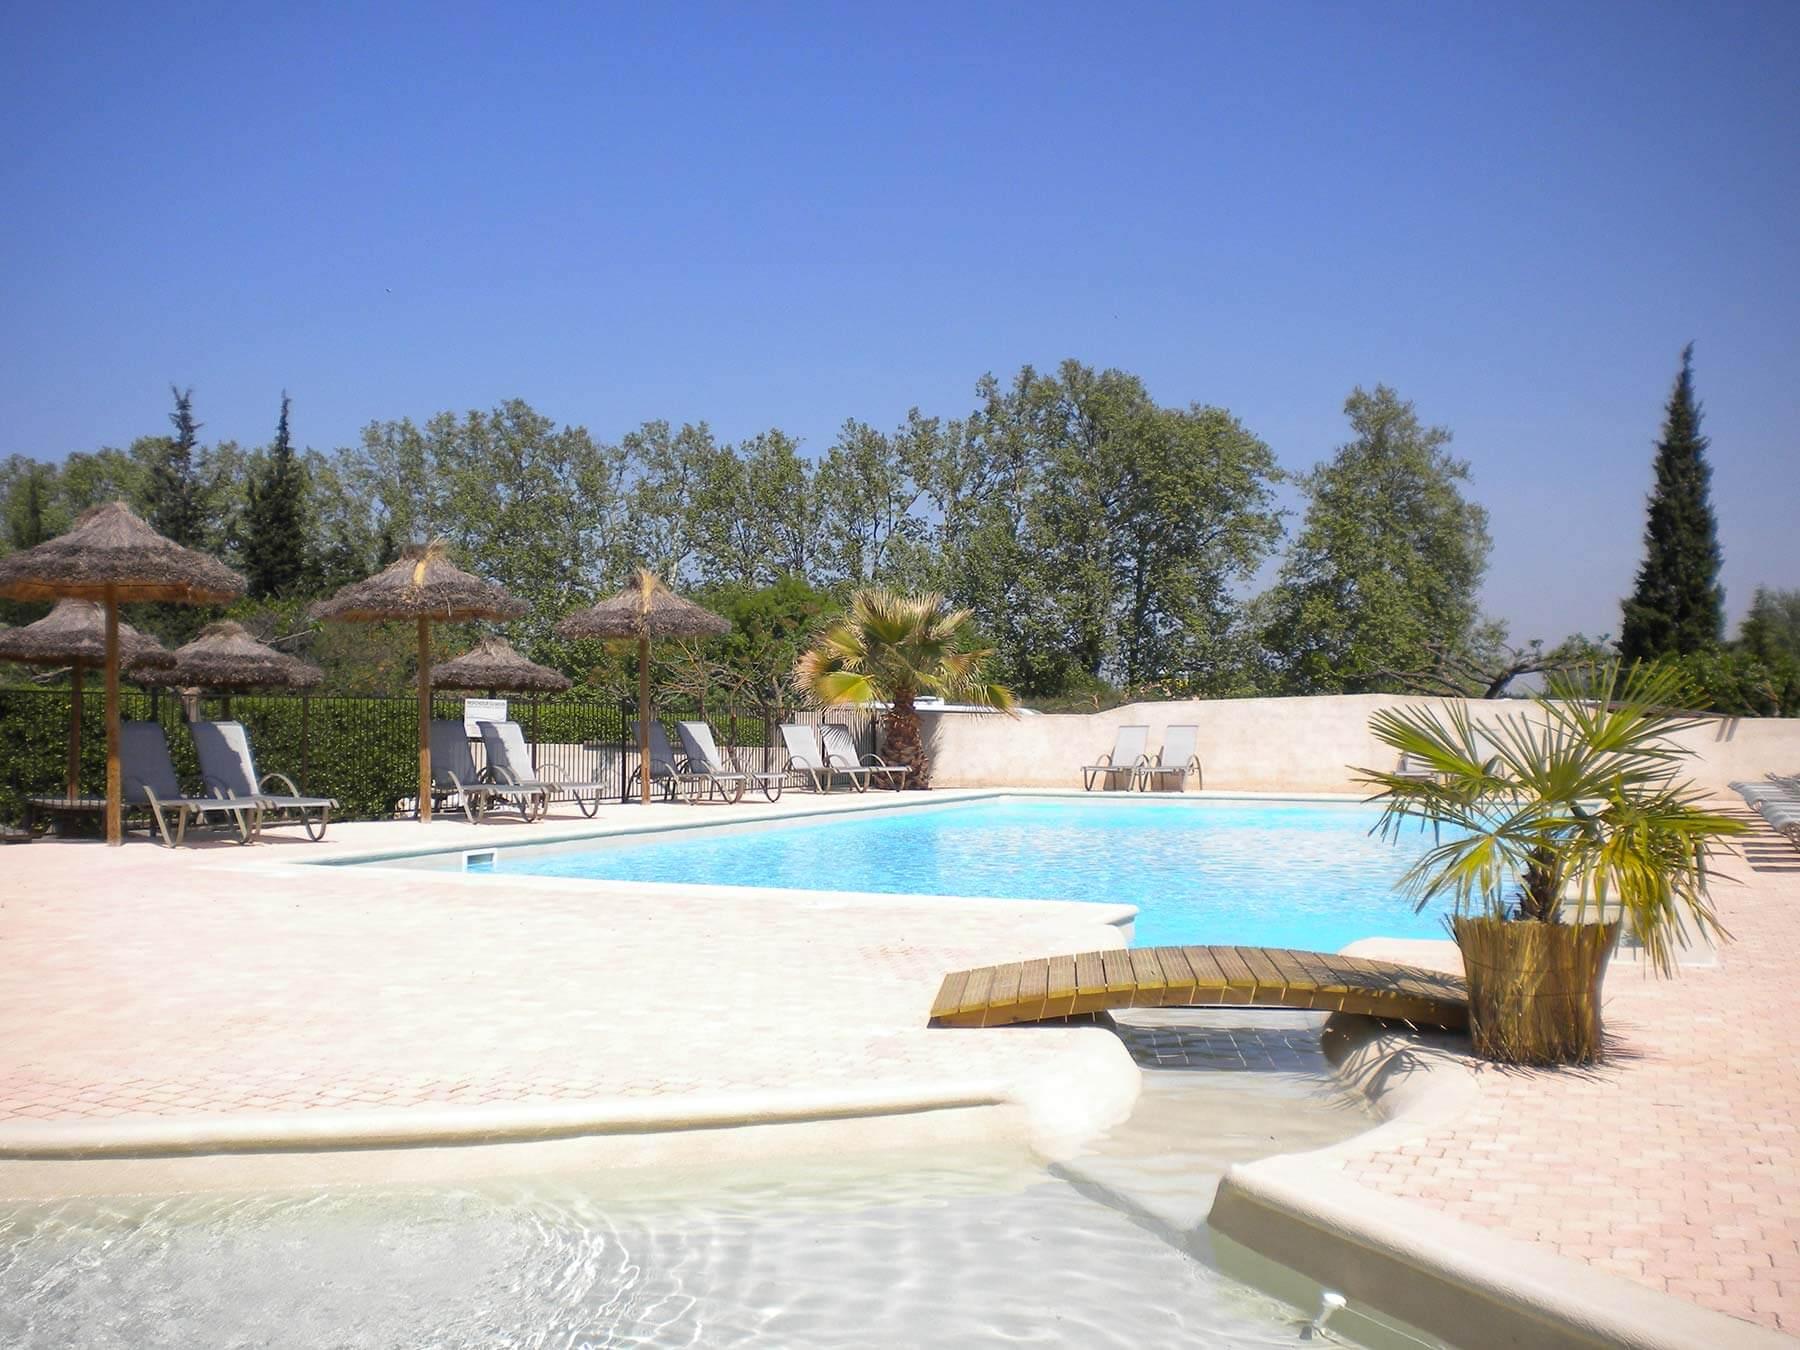 Camping Avignon Avec Piscine | Piscine Chauffée Dans Le Vaucluse avec Camping Avignon Avec Piscine